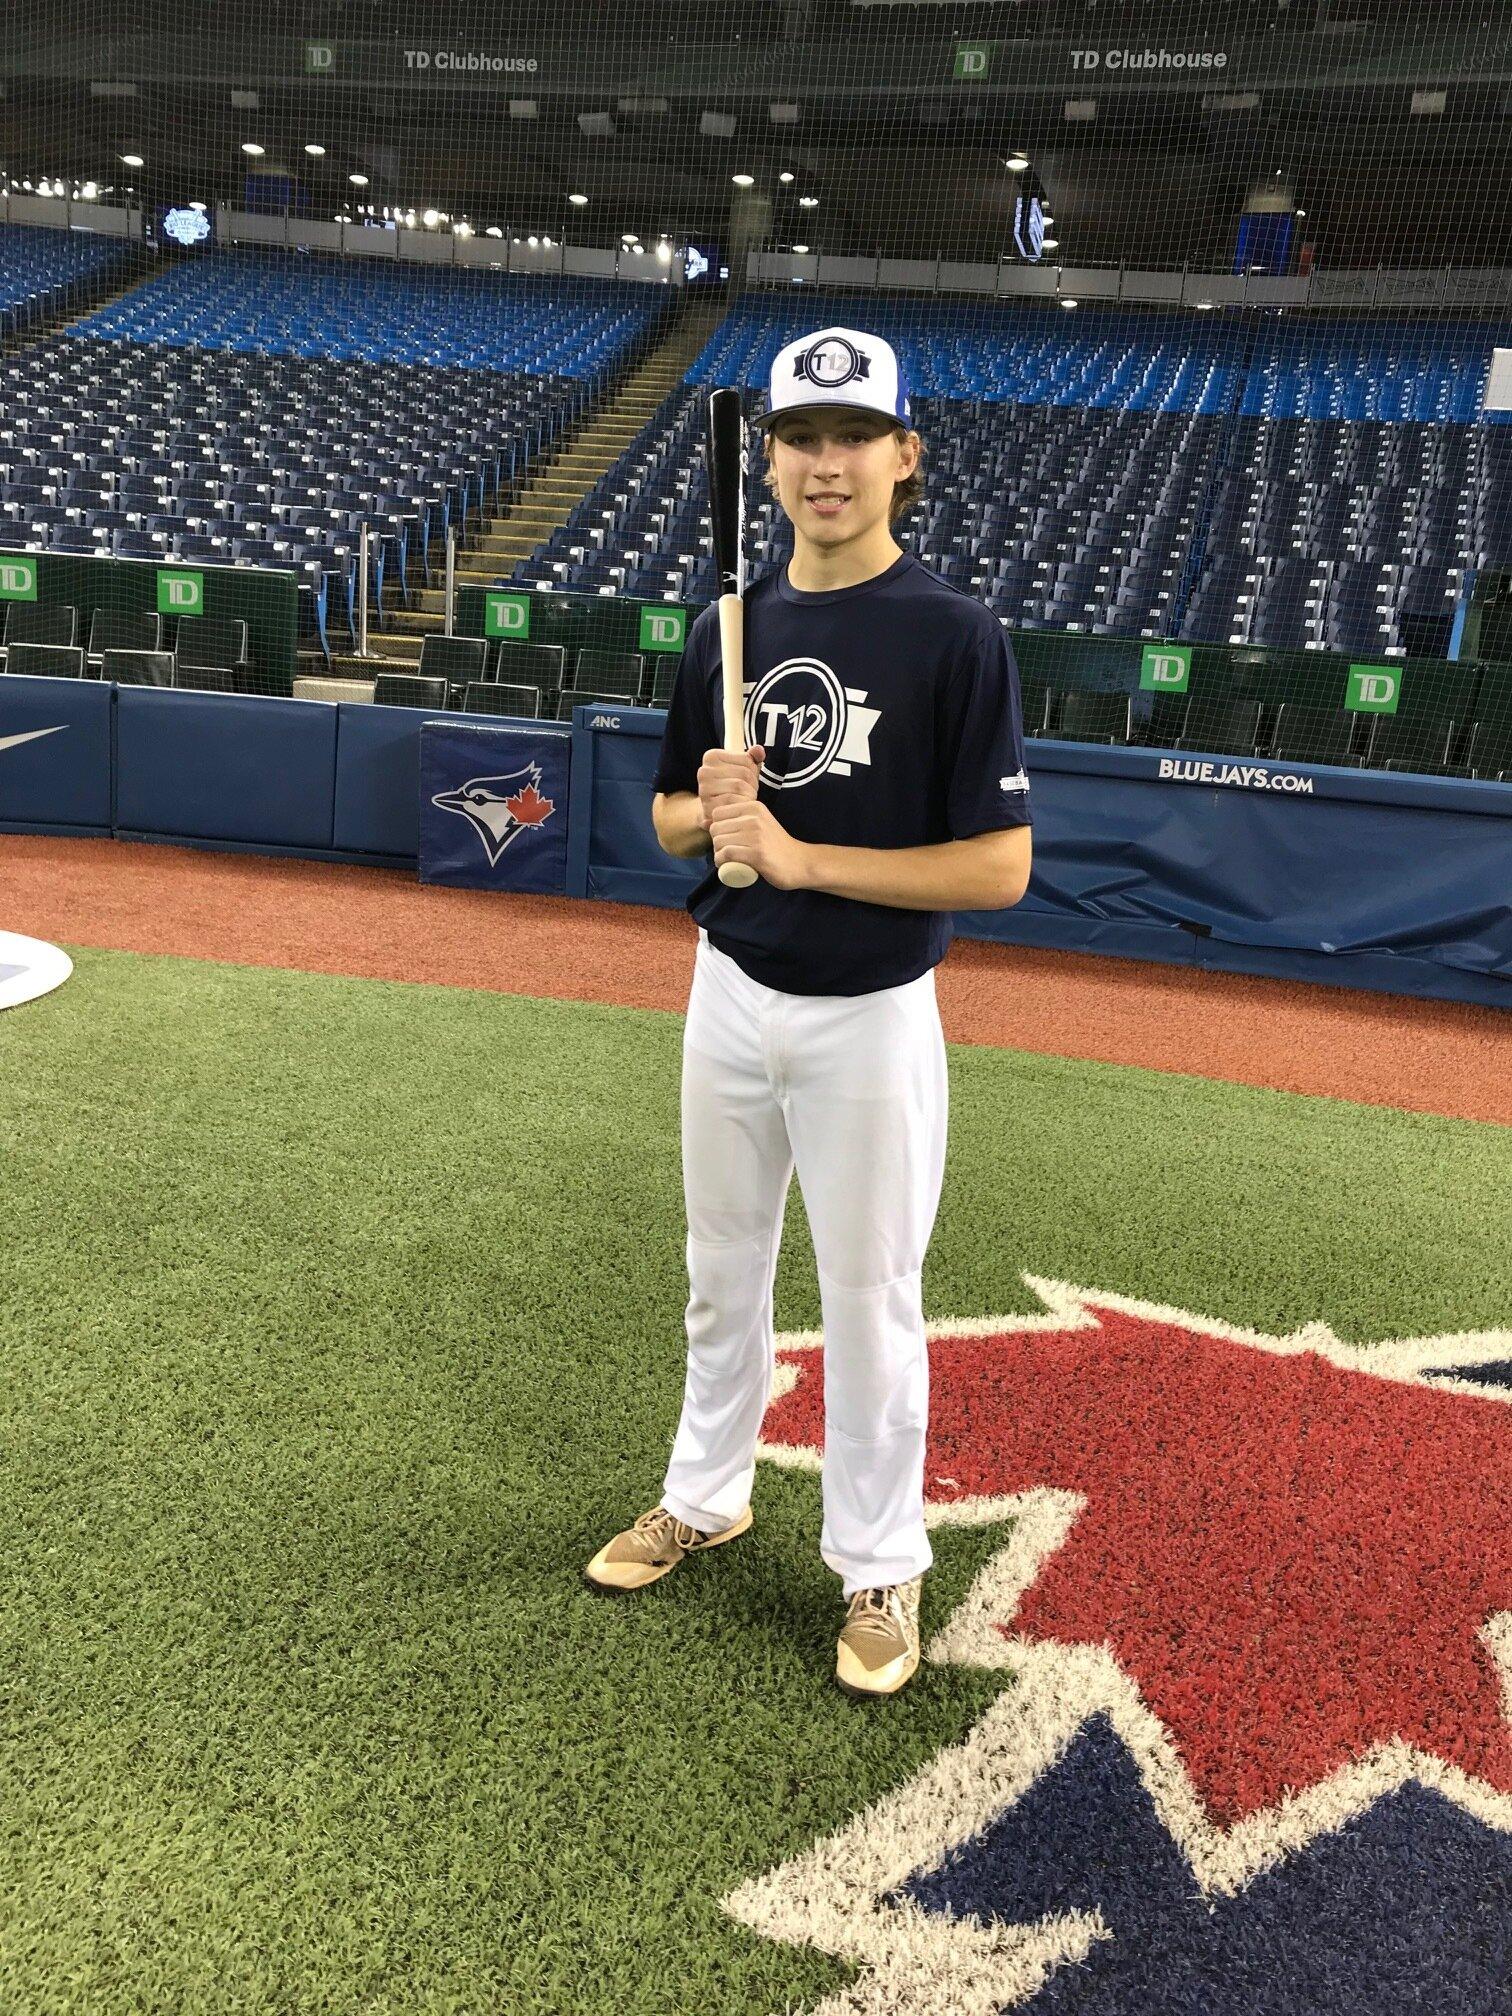 A strong showing at Tournament 12 has high schooler Matthew Grabmann (Cole Harbour, N.S.) on scouts' radar. Photo: J.P. Antonacci